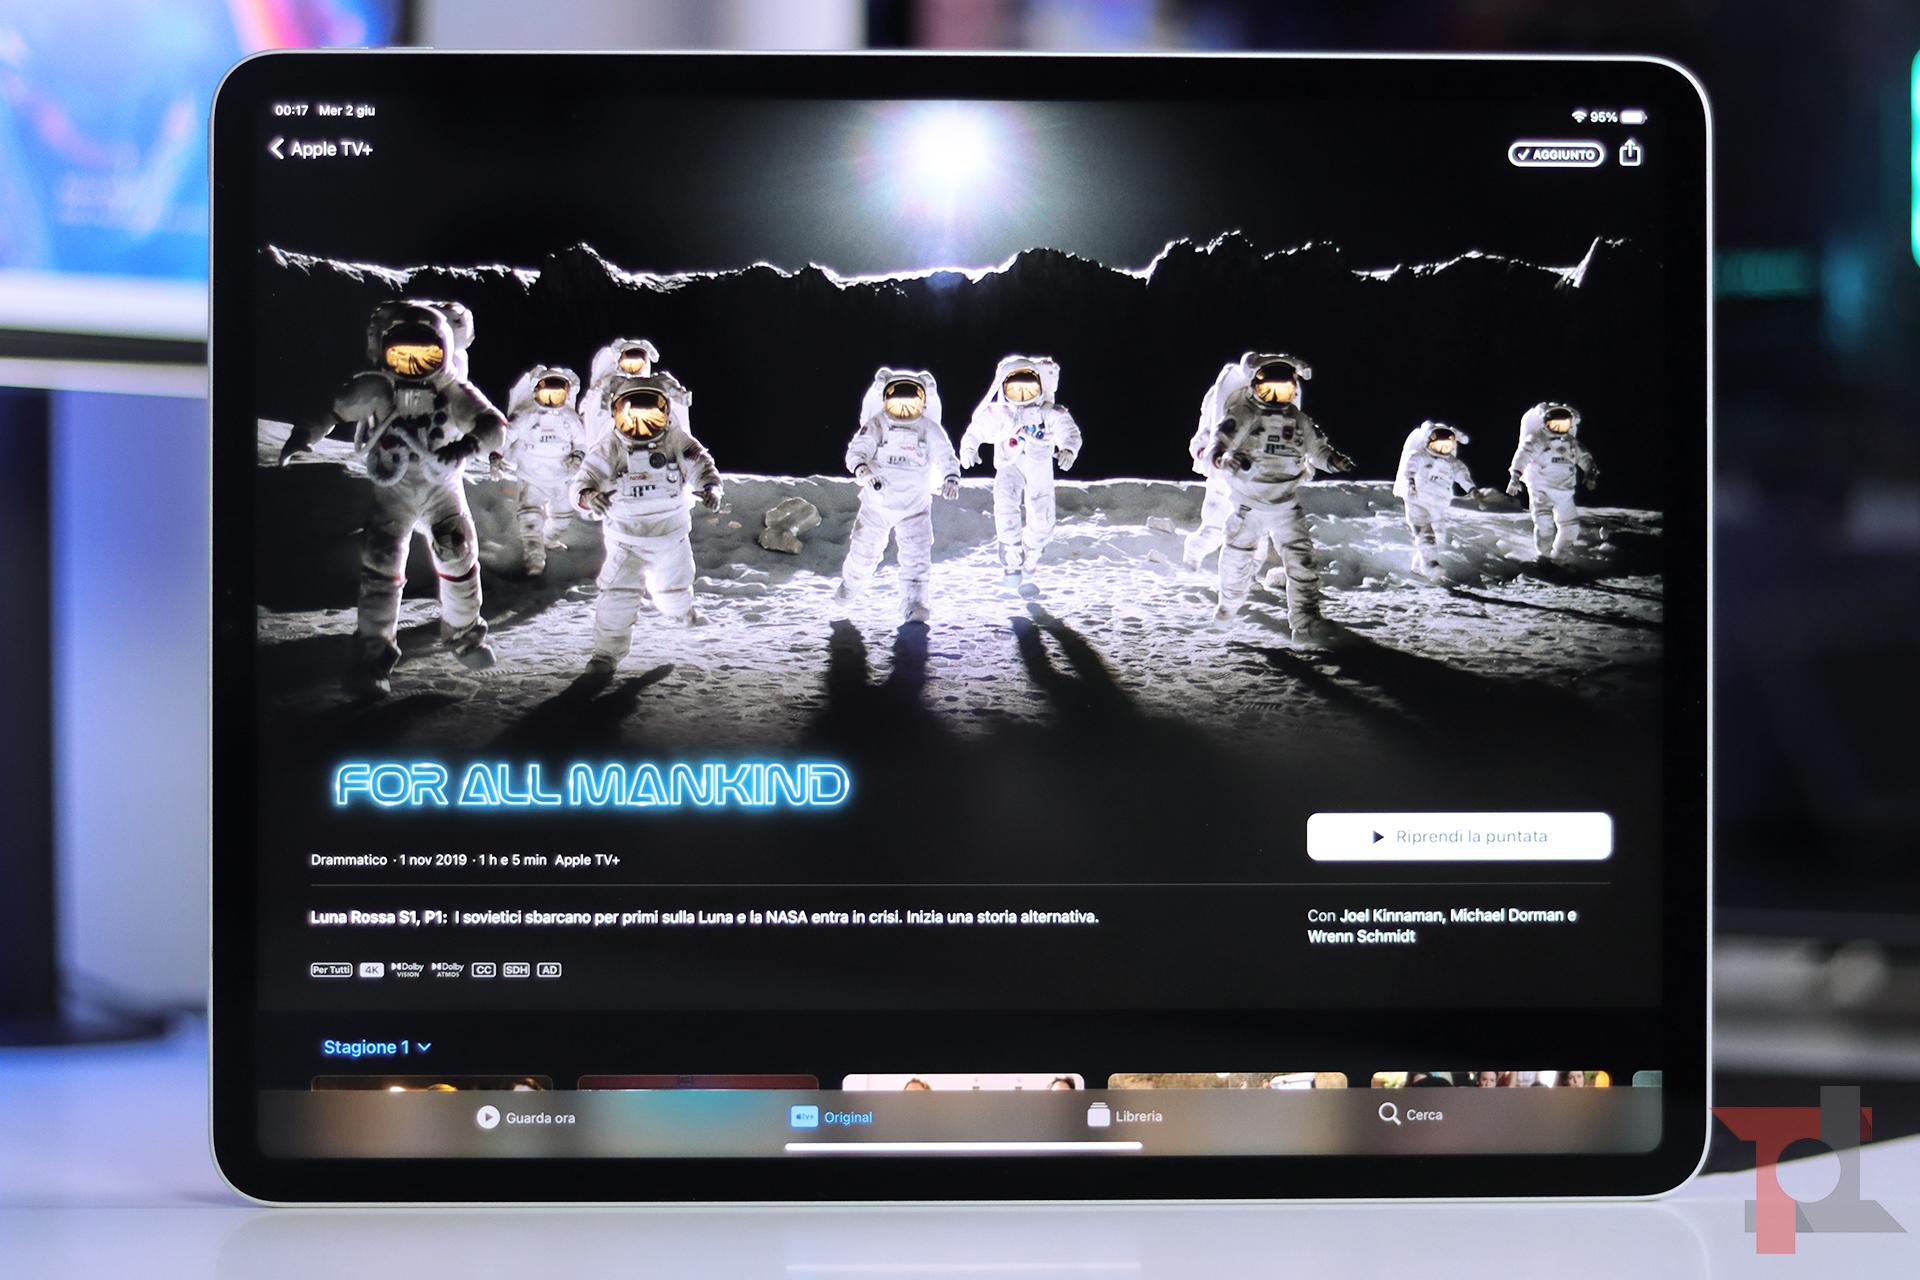 iPad Pro M1 display